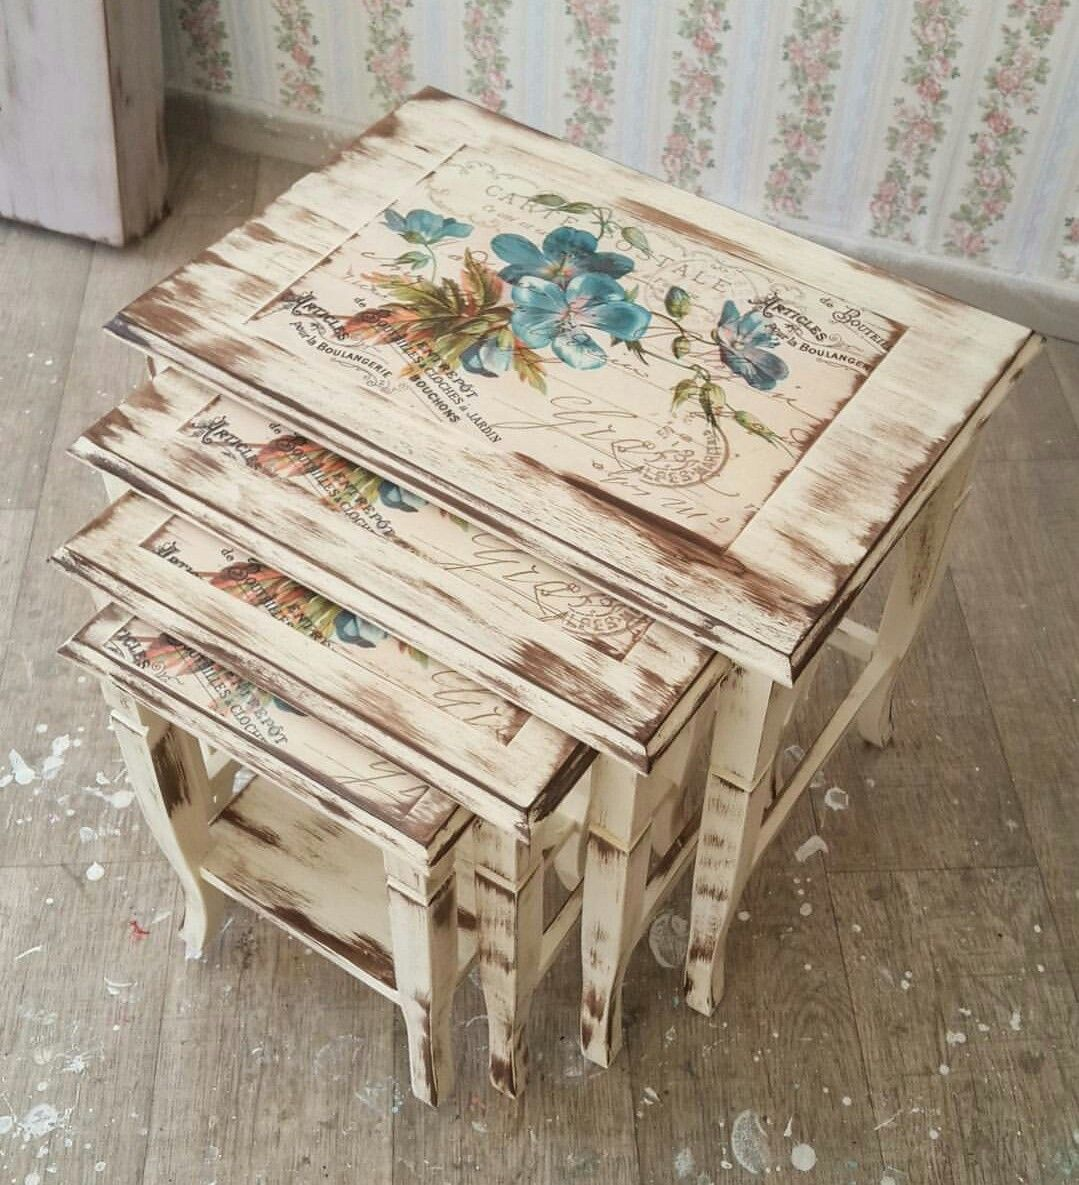 Incroyable Handmade Furniture, Decoupage Furniture, Painted Furniture, Decoupage Art, Decoupage  Ideas, Furniture Makeover, Wood Paintings, Kaftan, Interiors